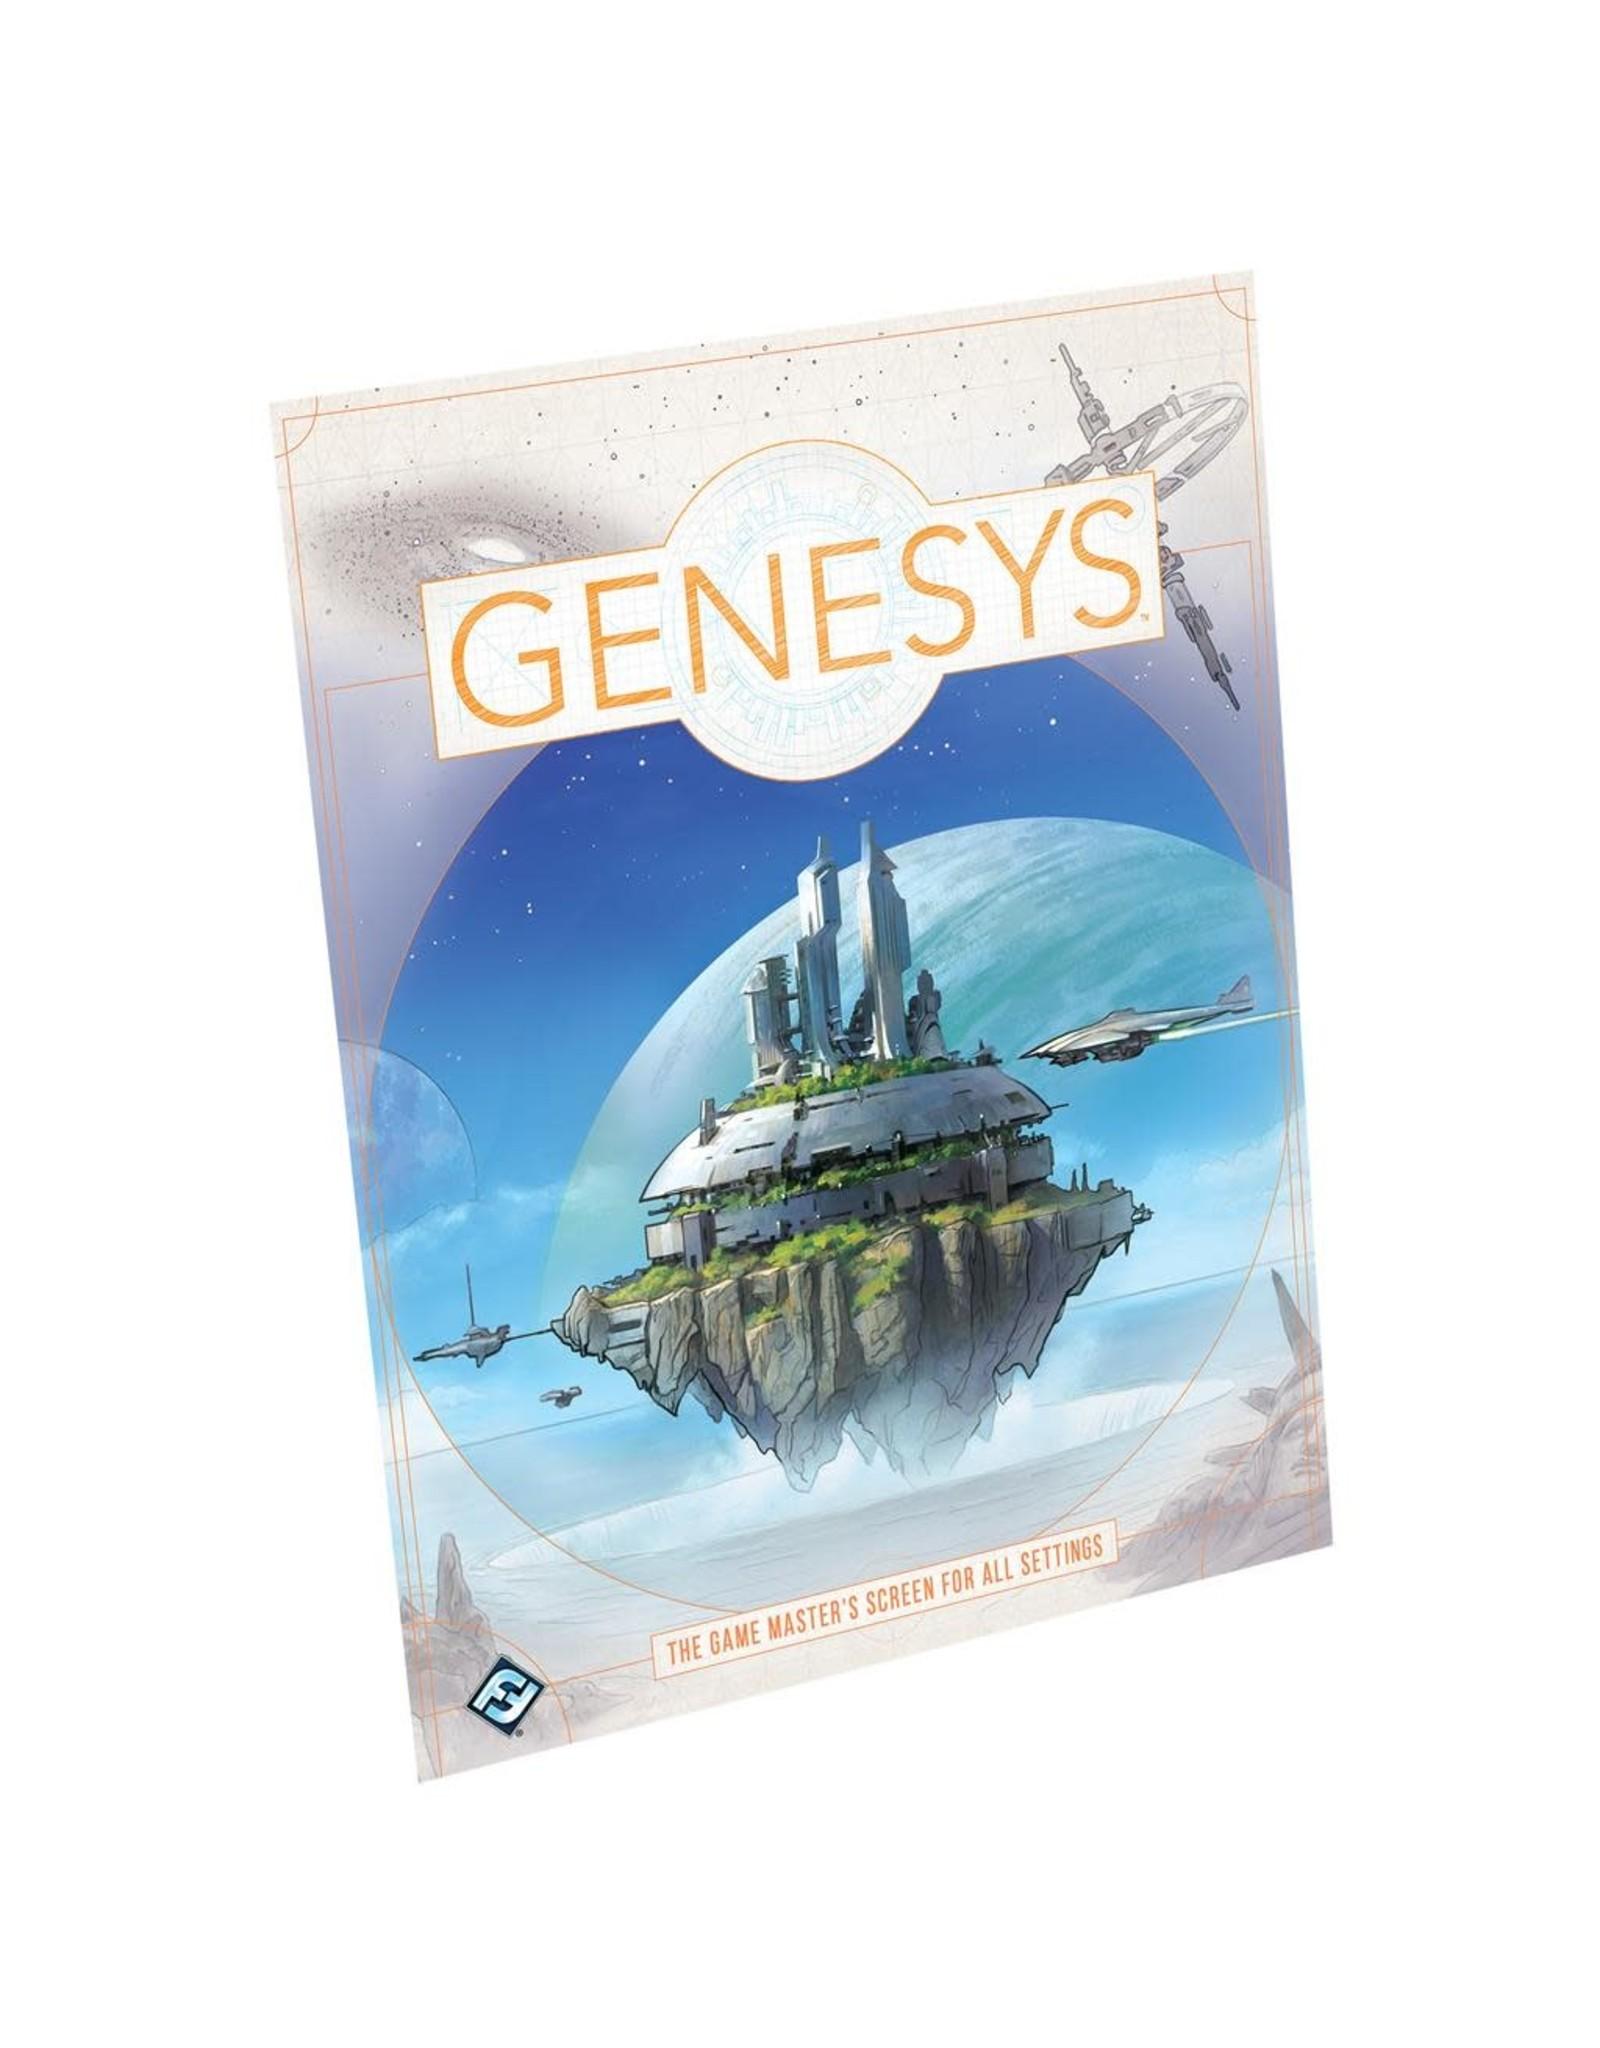 Fantasy Flight Games Genesys Game Master's Screen